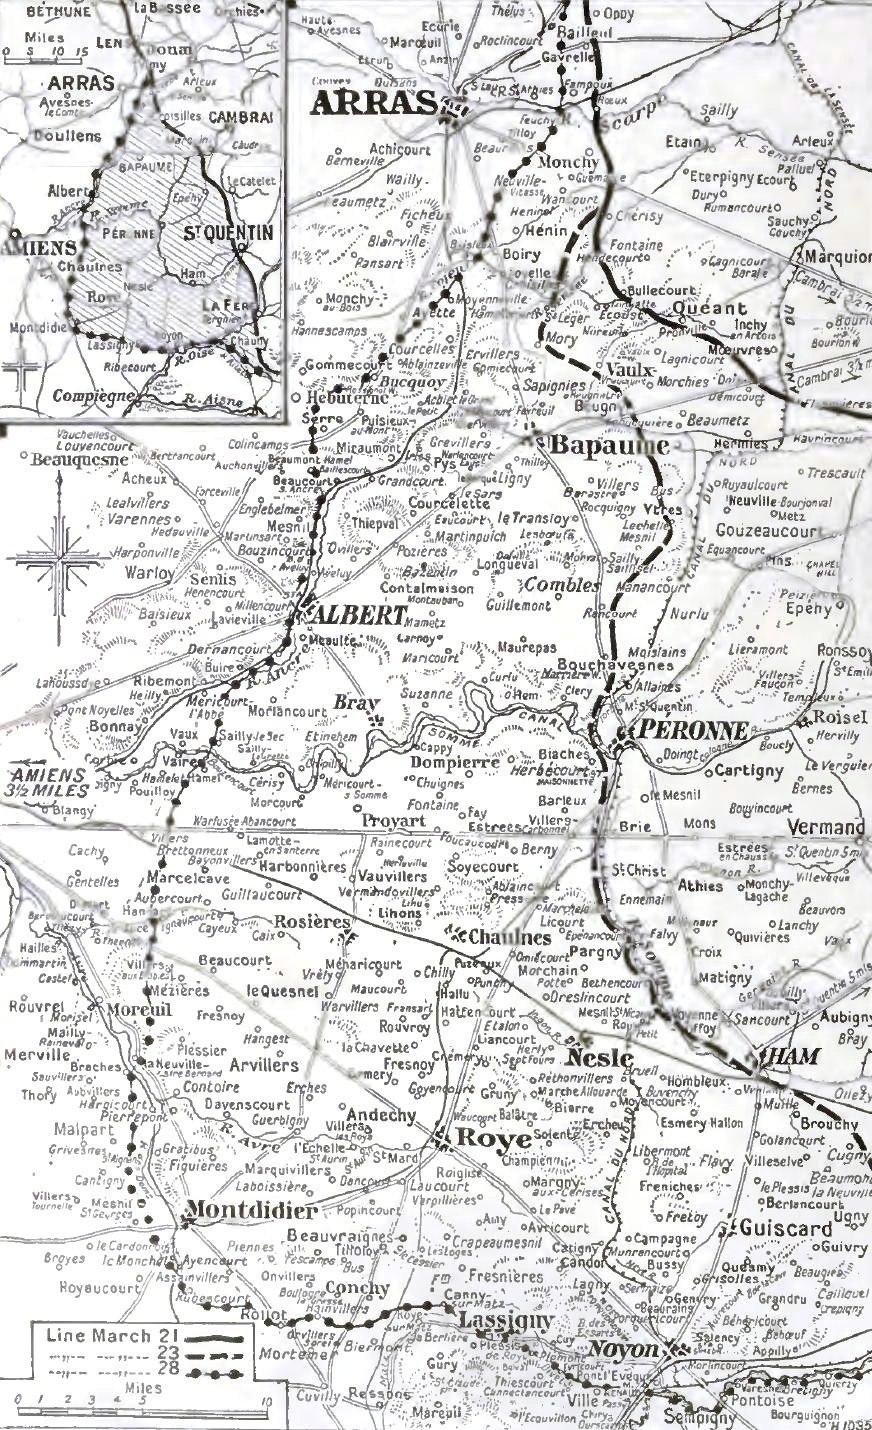 German advance, 23-28 March 1918